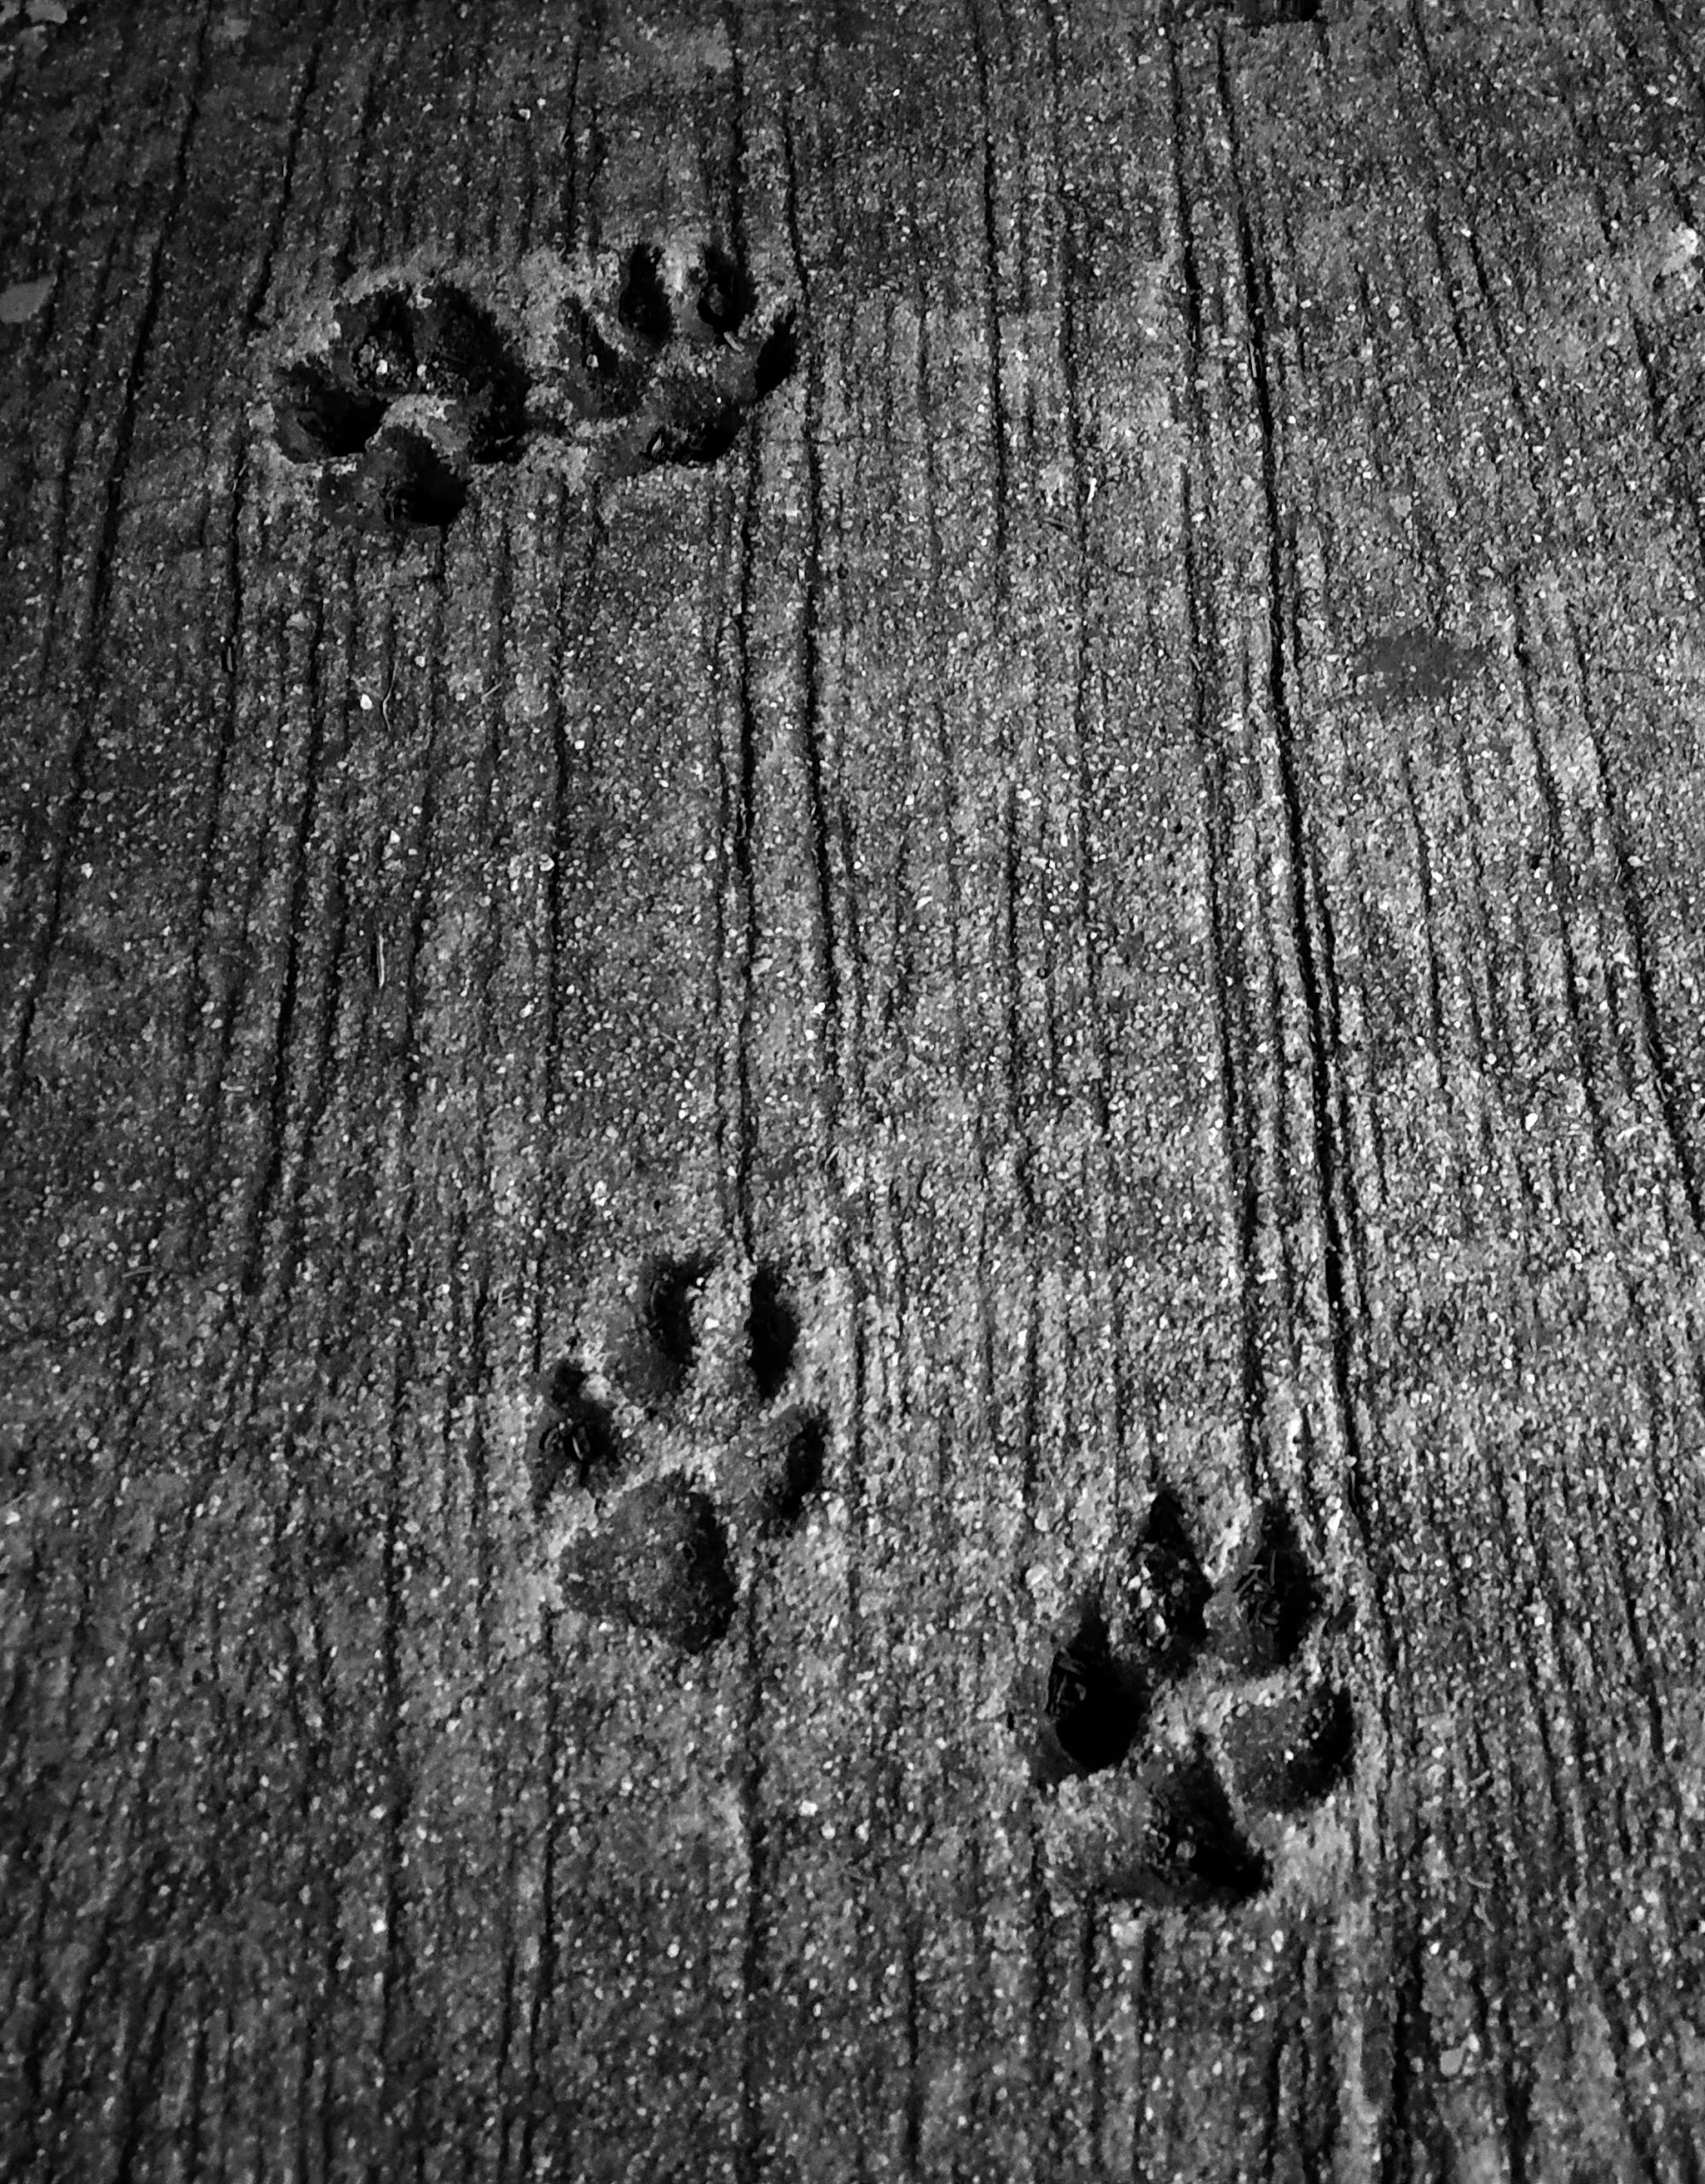 Dog pawmarks